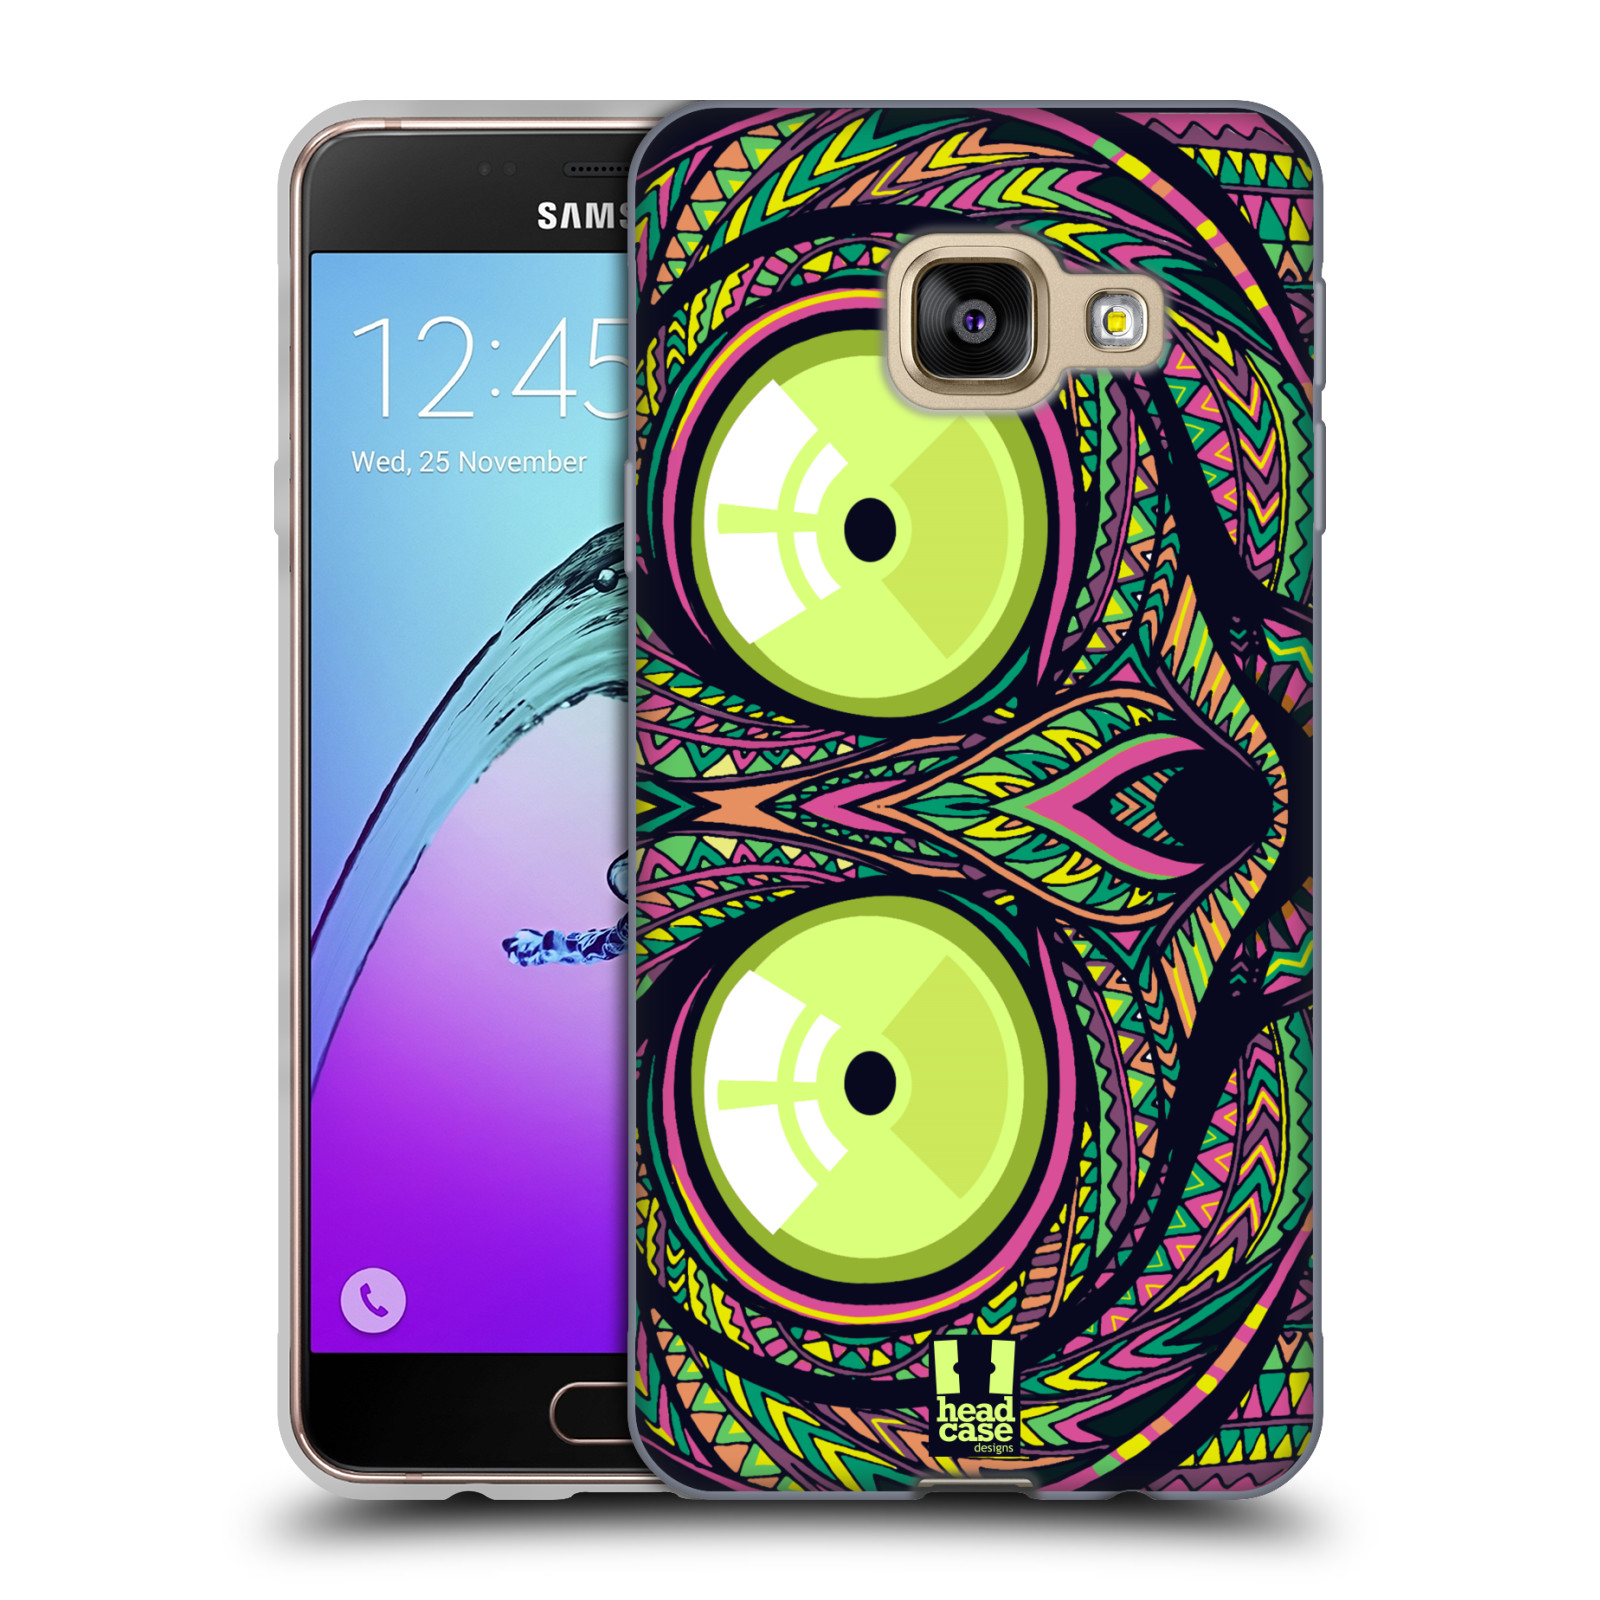 Silikonové pouzdro na mobil Samsung Galaxy A3 (2016) HEAD CASE AZTEC NÁRTOUN